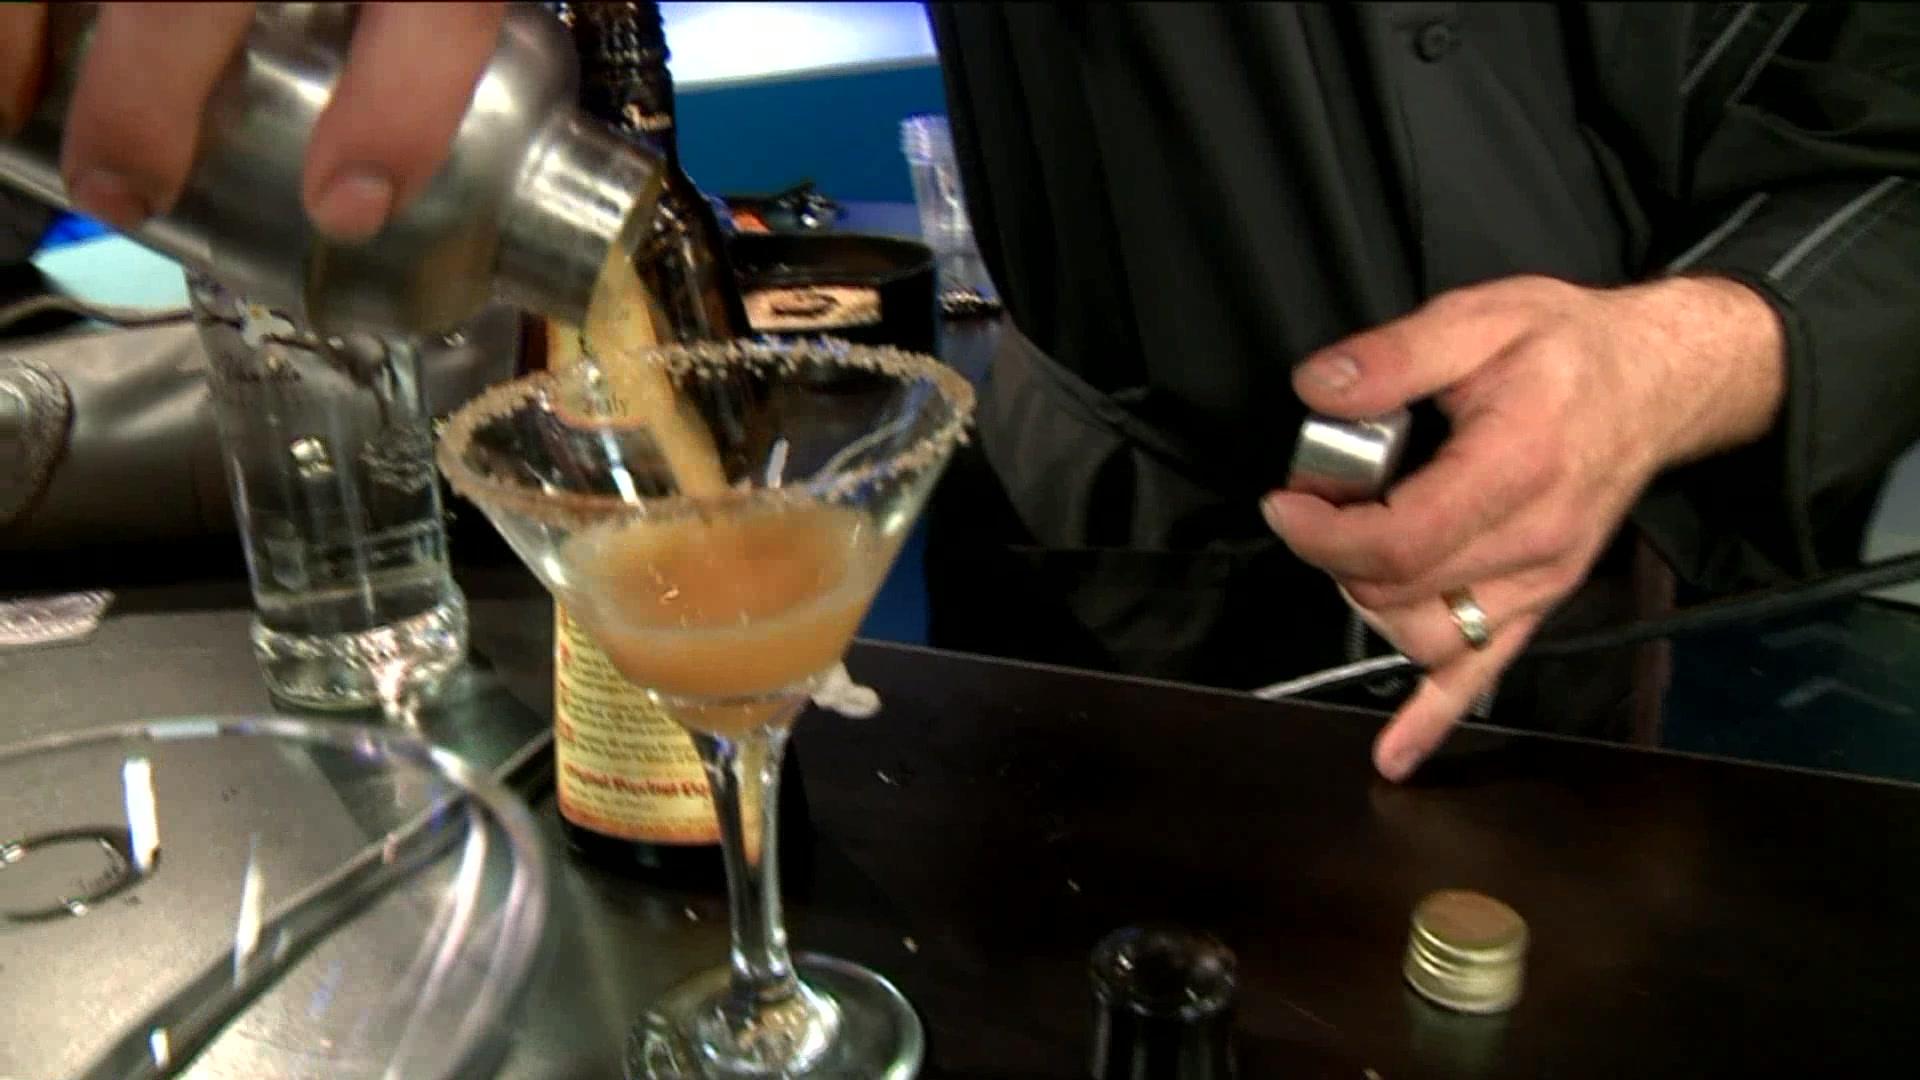 How to Make a Pumpkin Martini